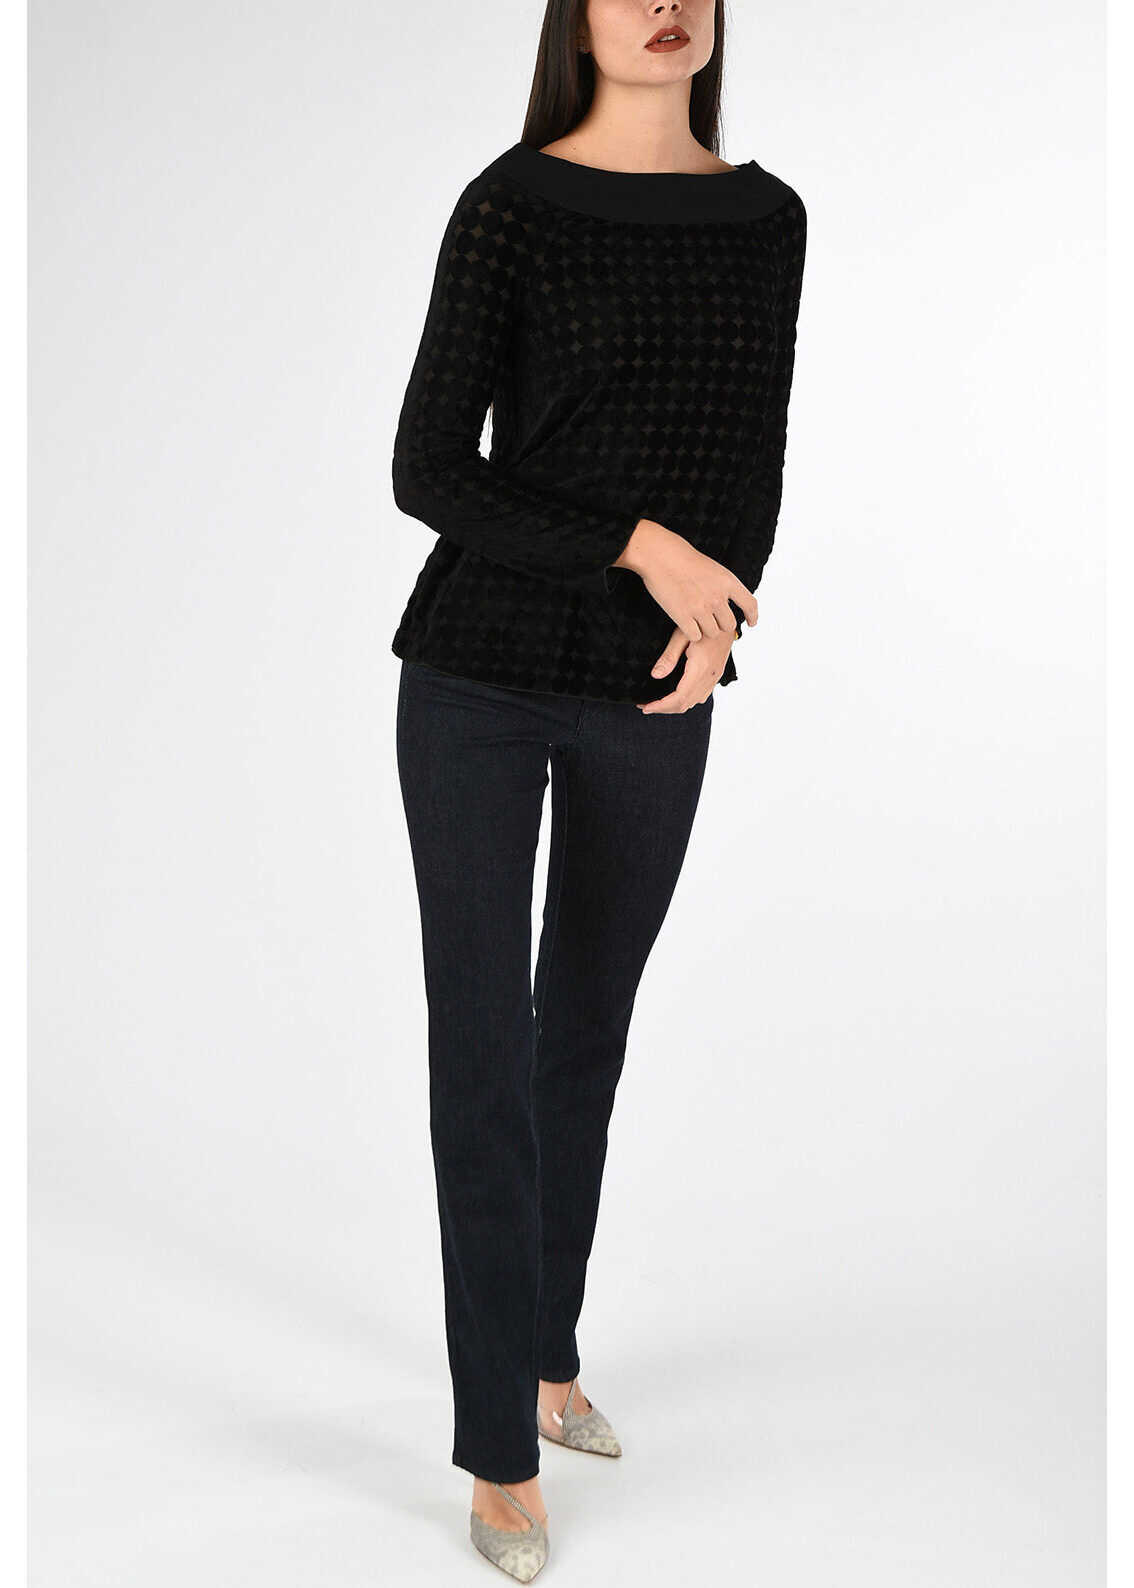 Armani COLLEZIONI Wool and Denim Jeans BLUE